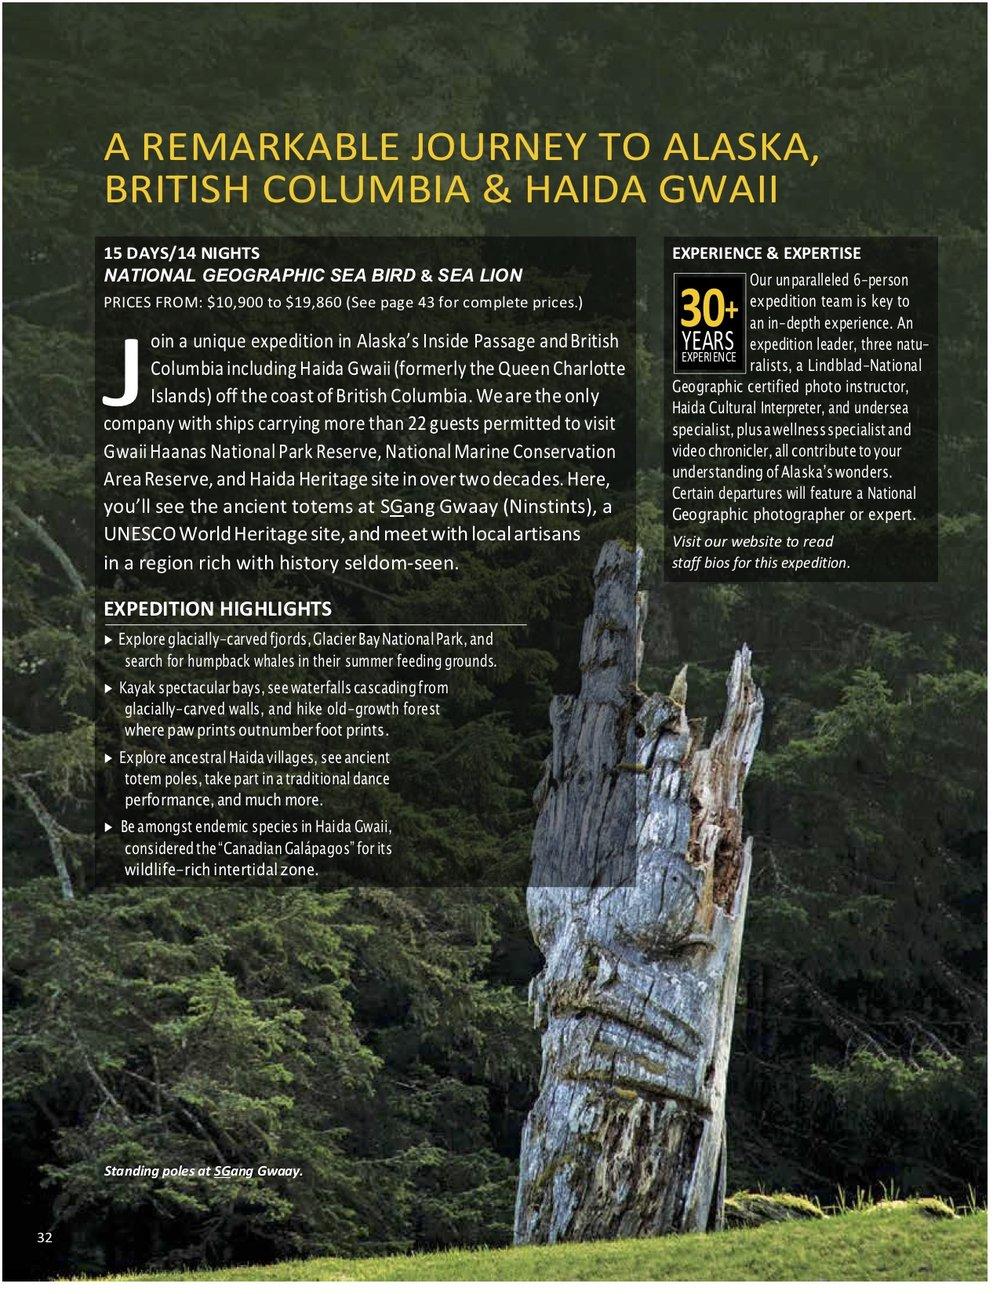 Haida Page 1 Itin.jpg